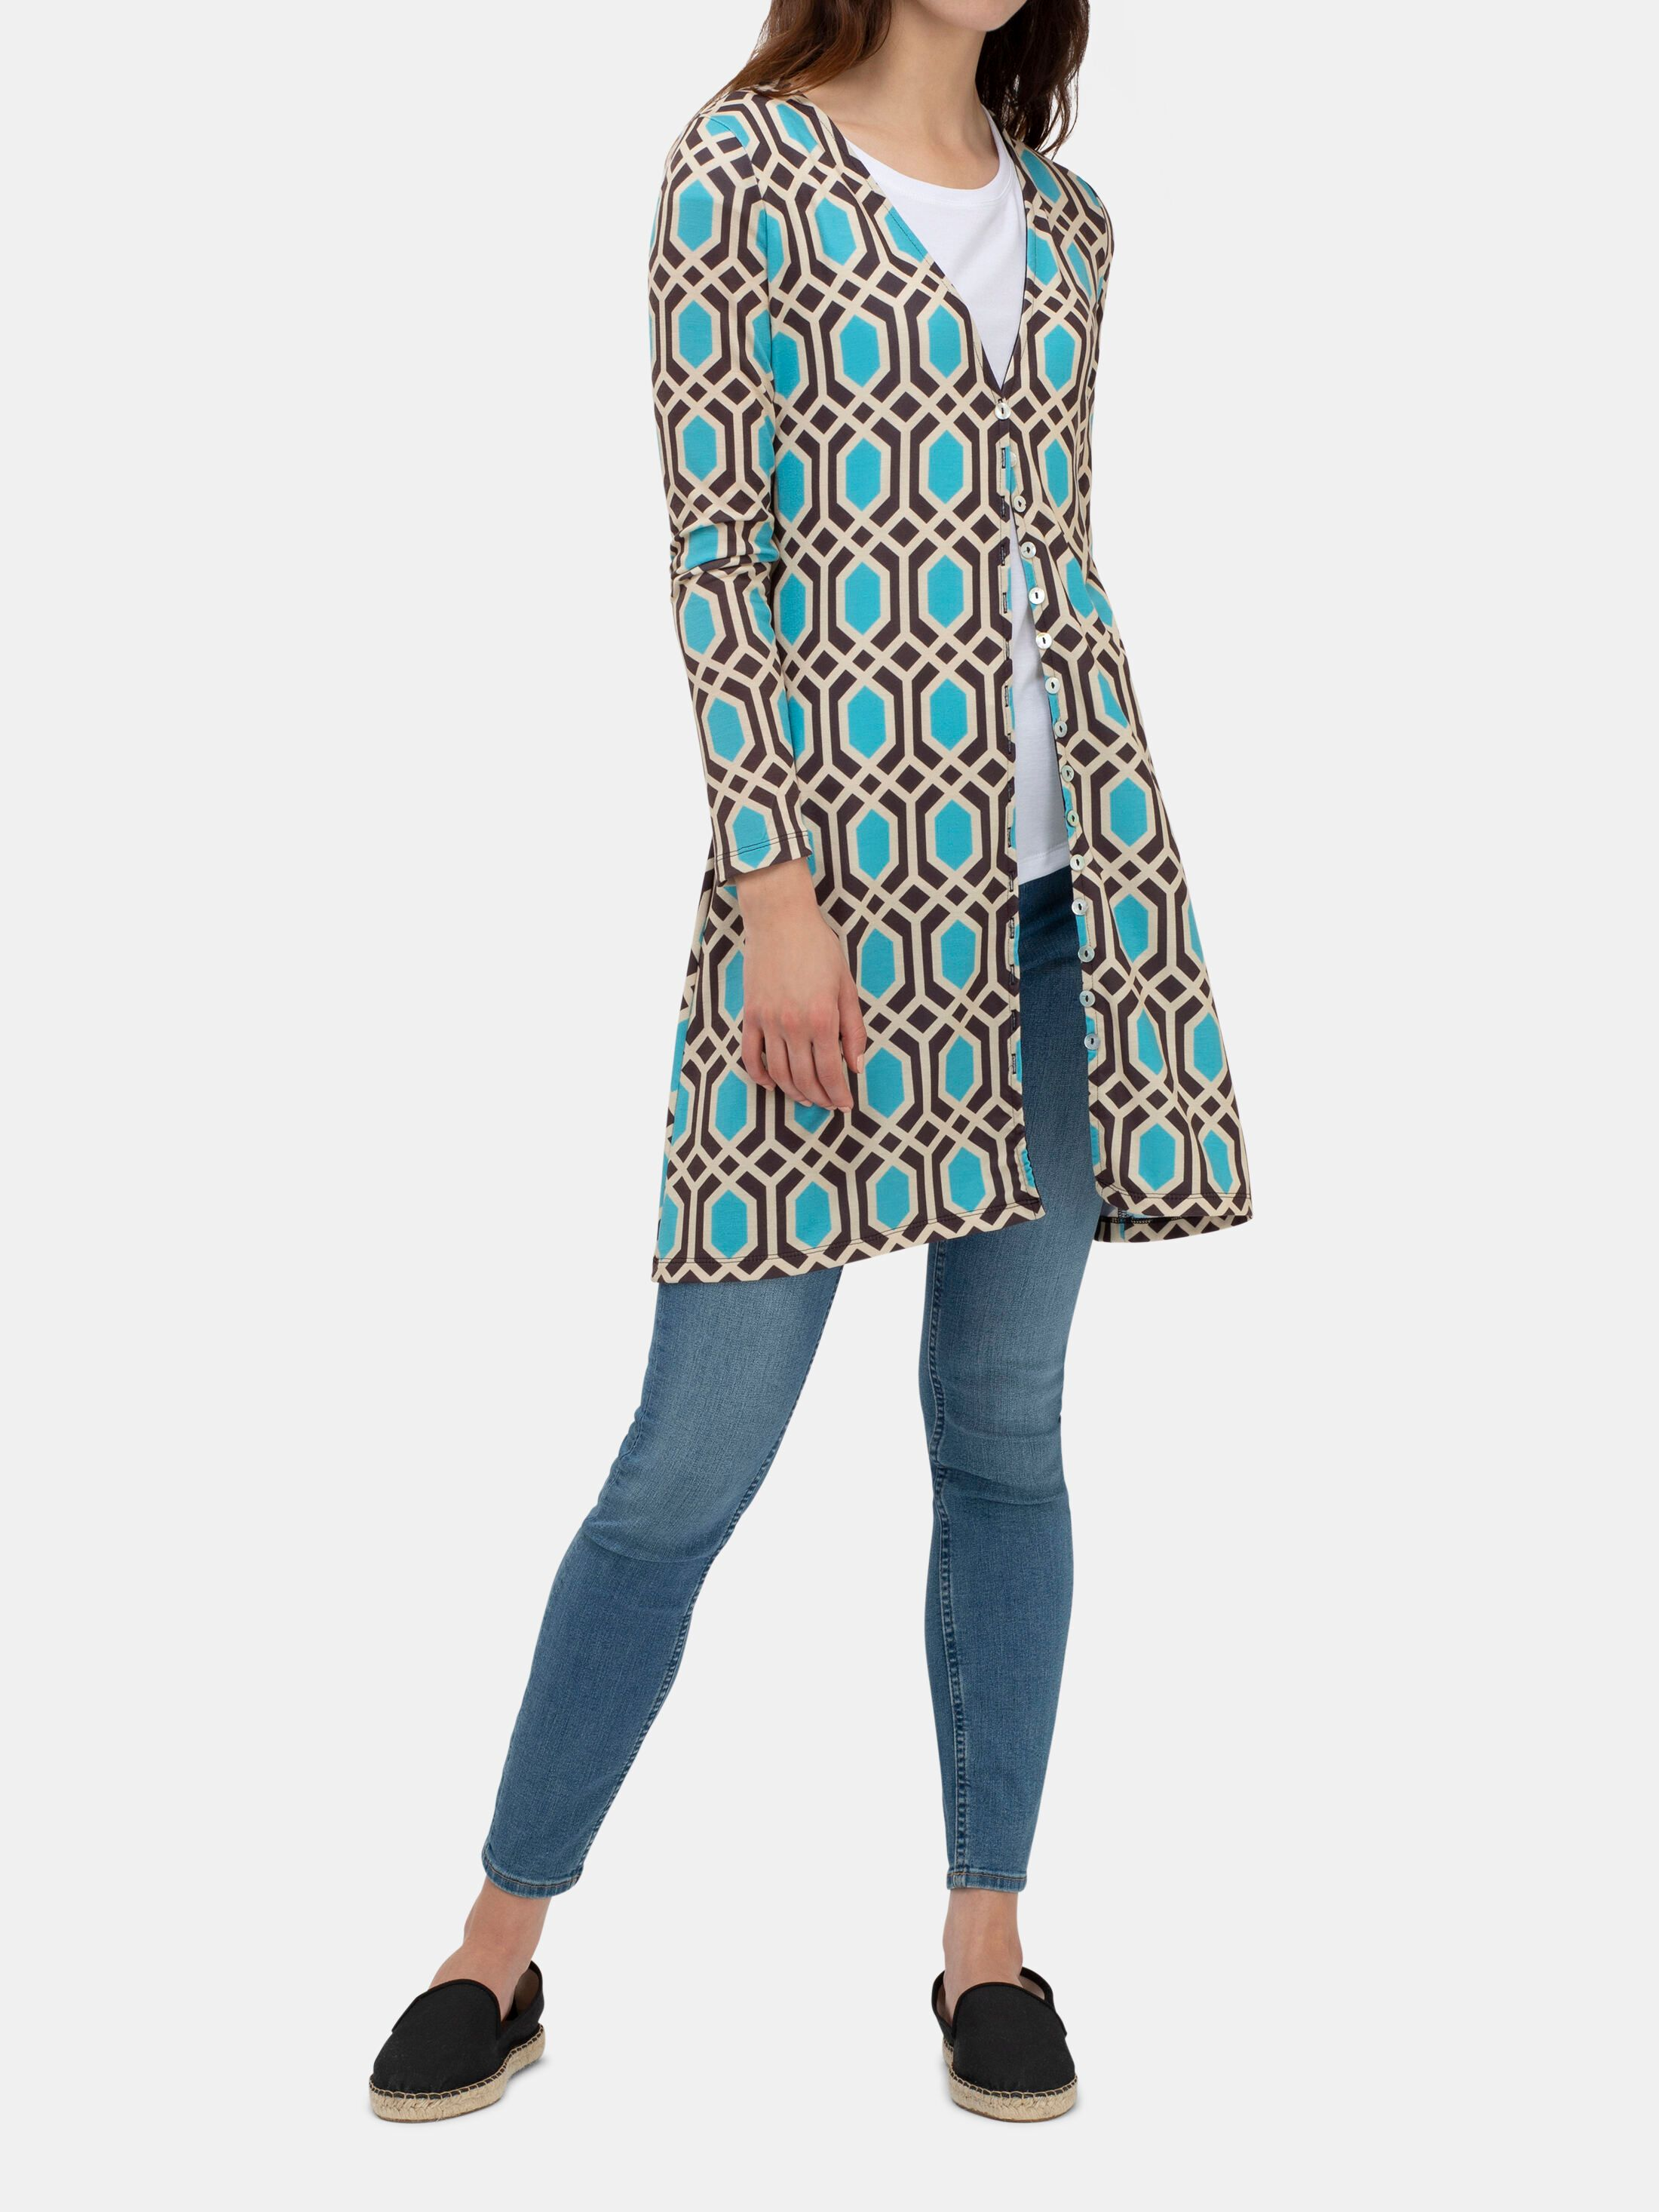 Design your own custom women's printed cardigan